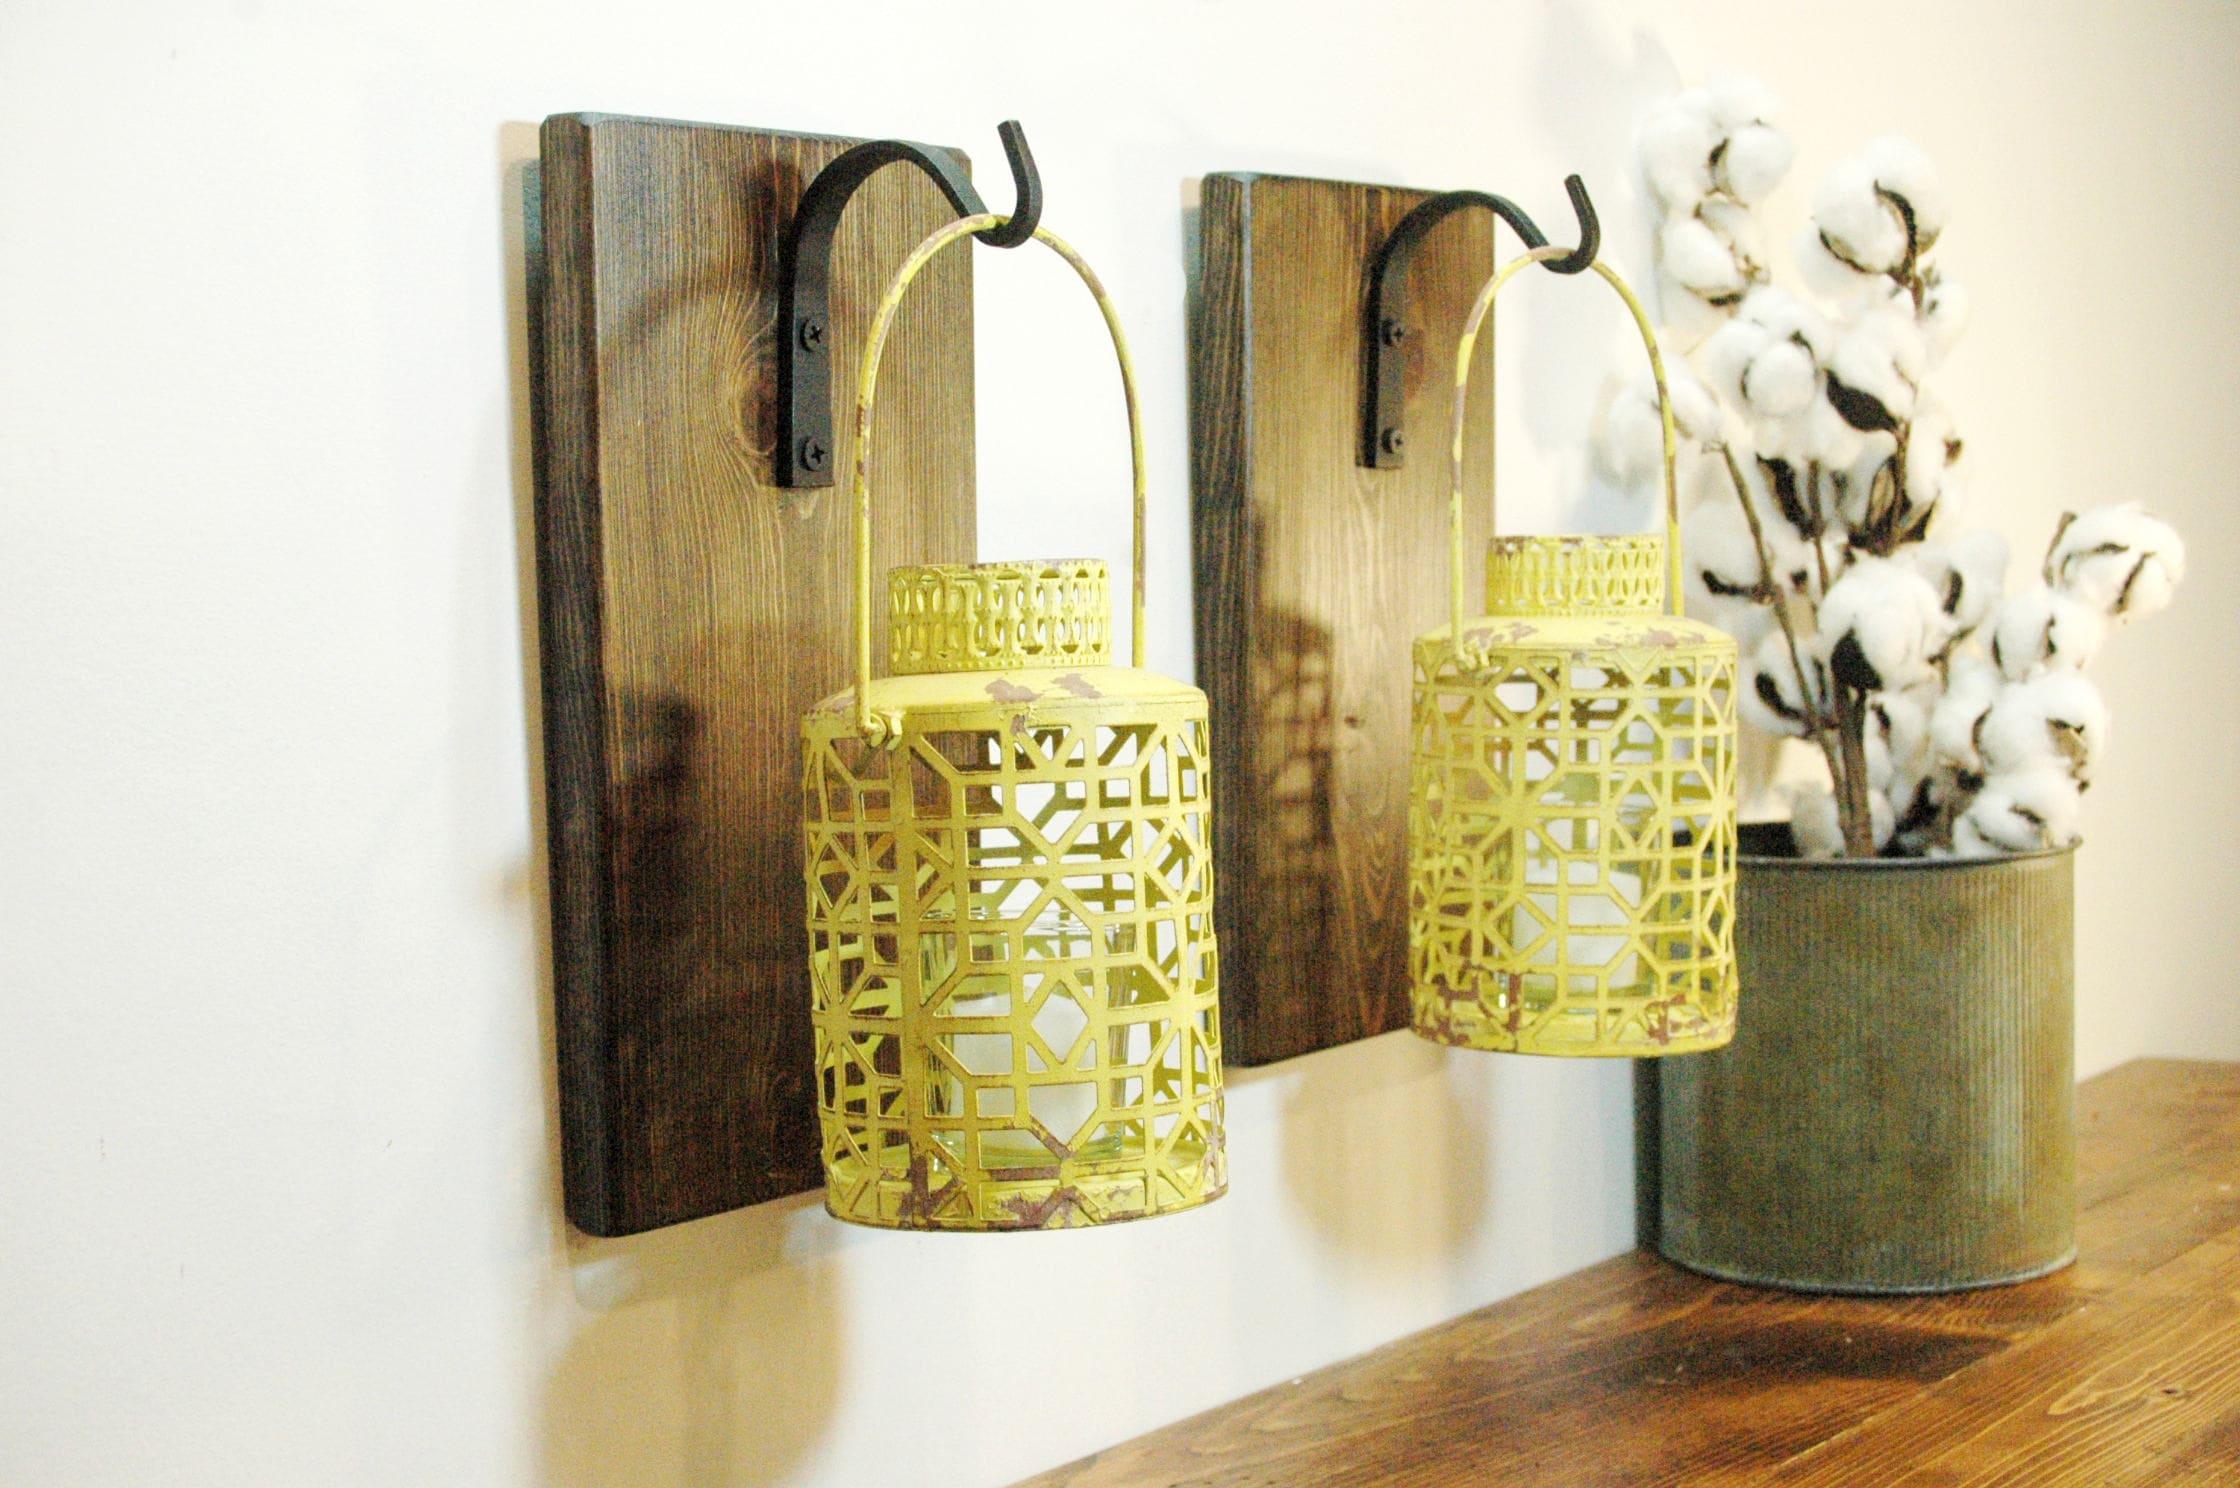 Metal Lantern Wall Decor Home Decor Yellow decor Modern